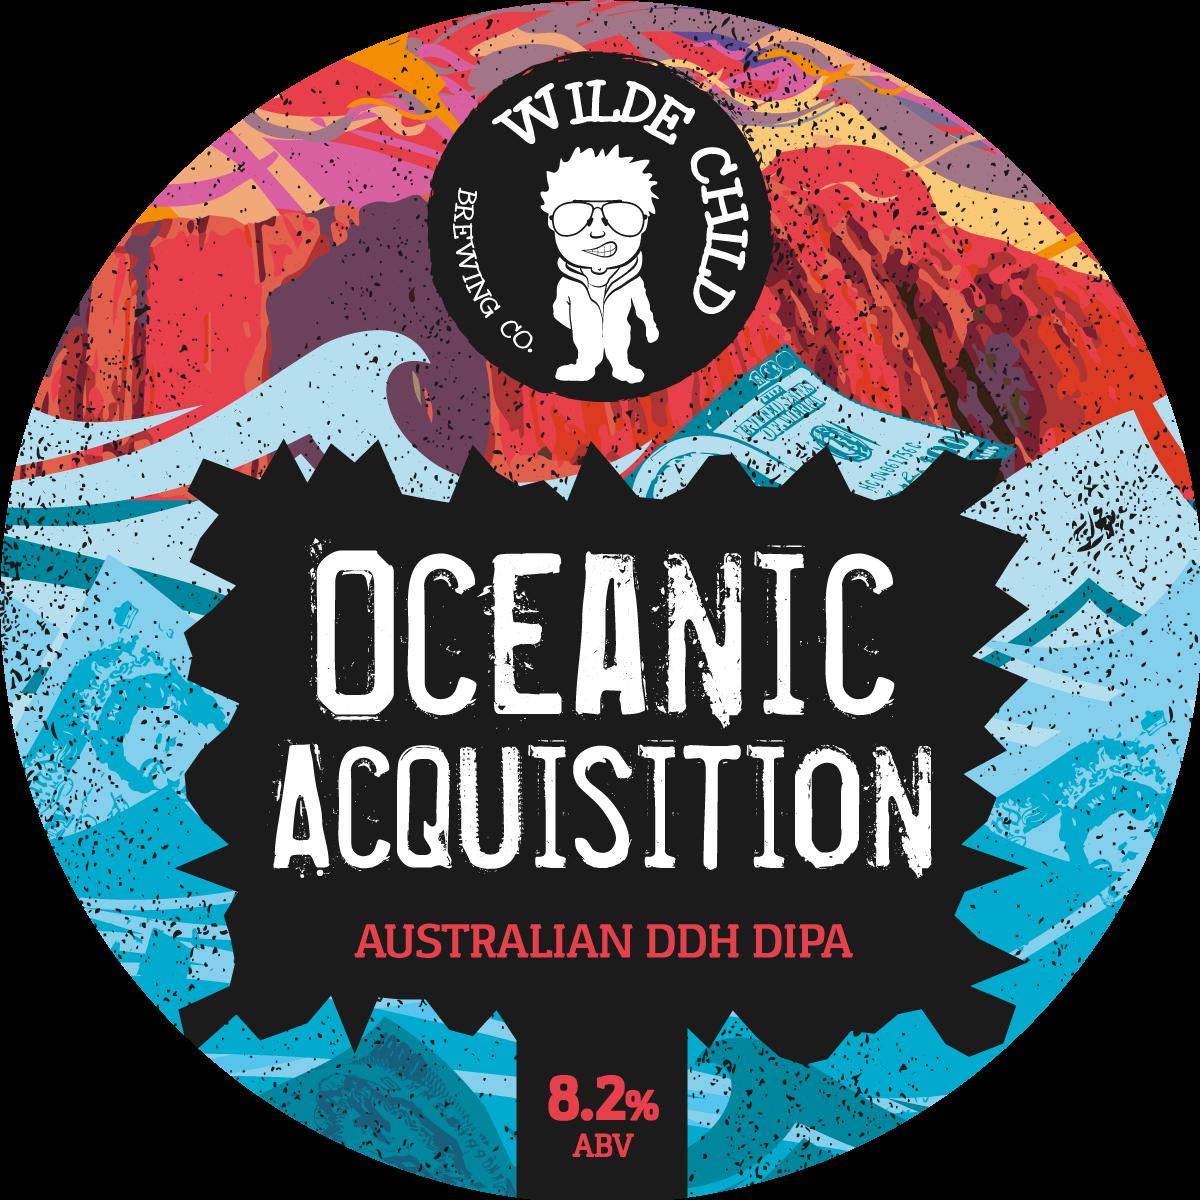 Oceanic-Acquisition-Round